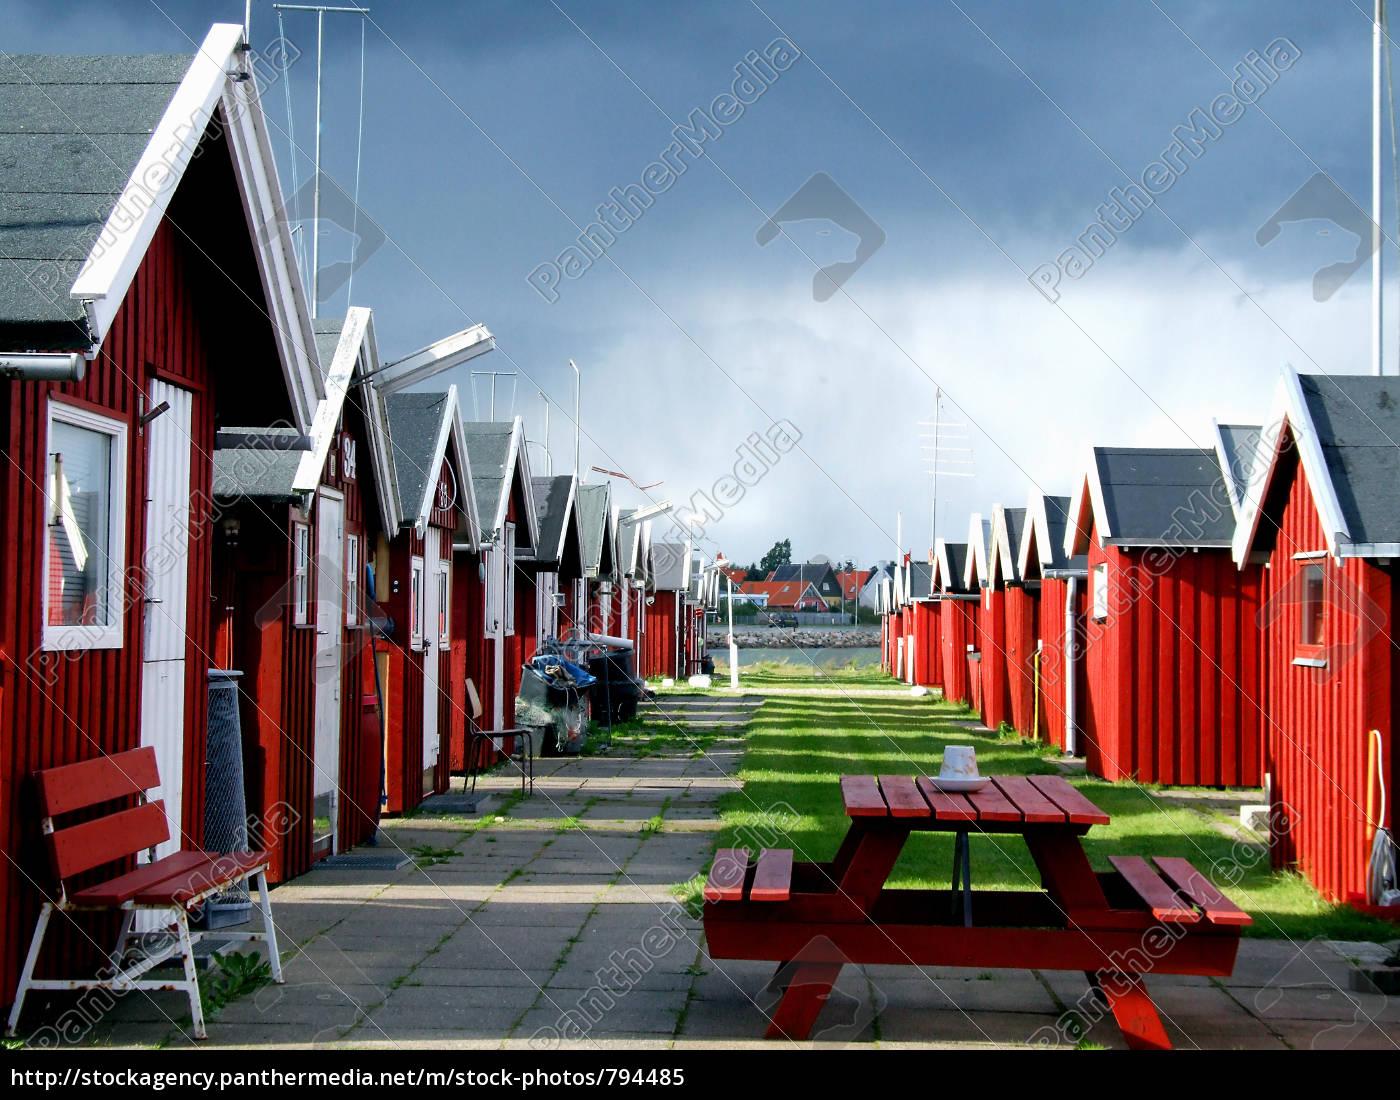 fishing, huts - 794485